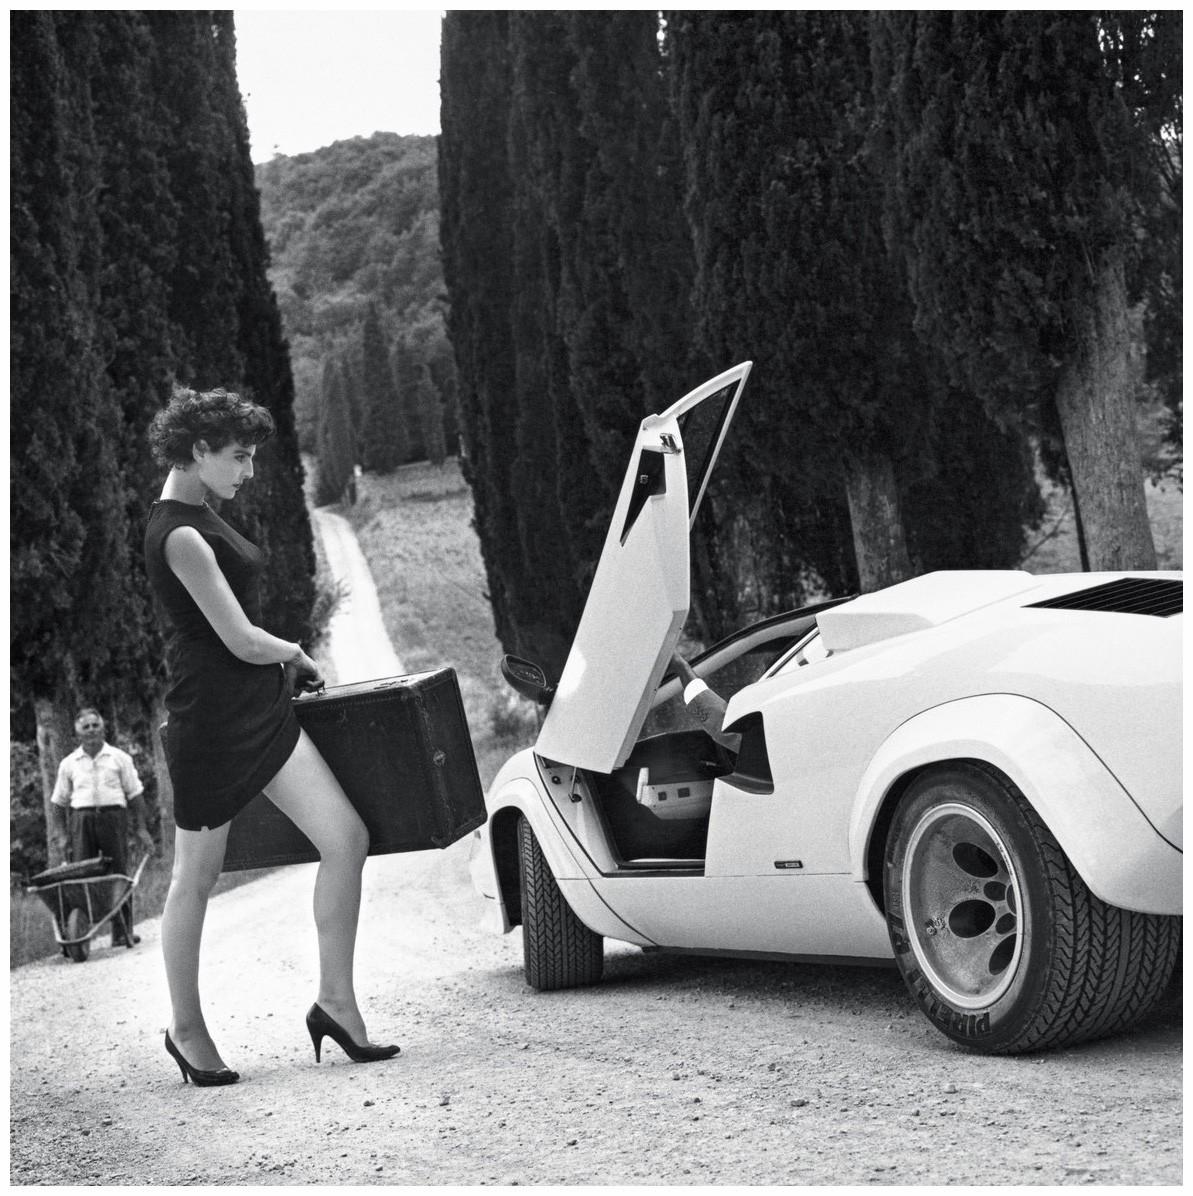 Для Pirelli Calendar, Италия, 1986. Фотограф Хельмут Ньютон